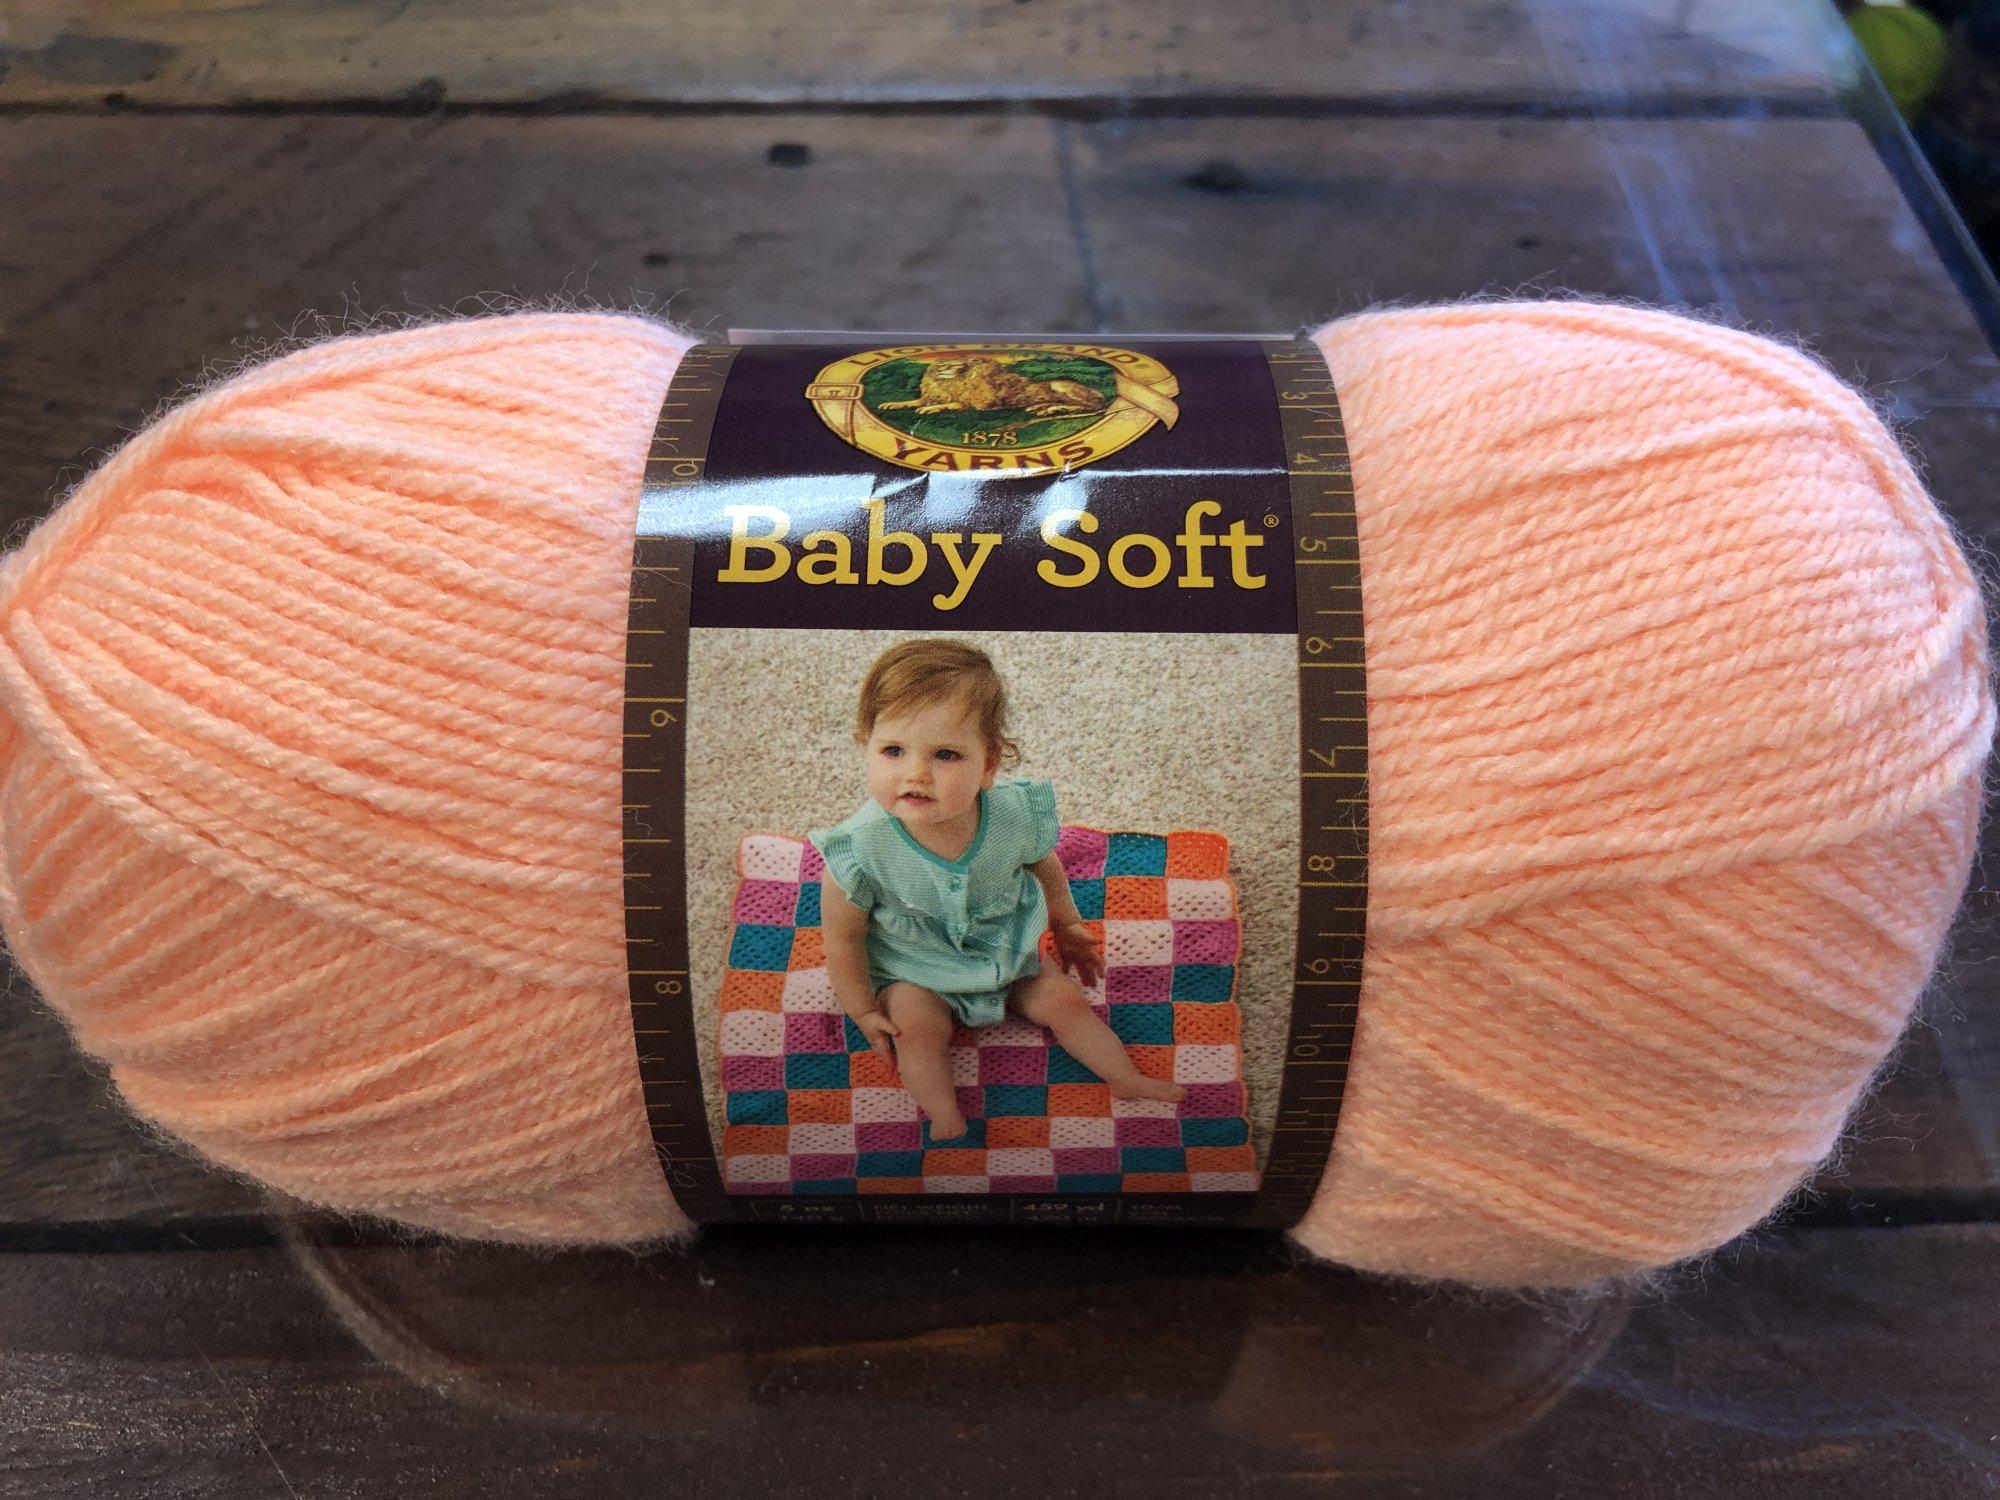 5oz Creamsicle Baby Soft